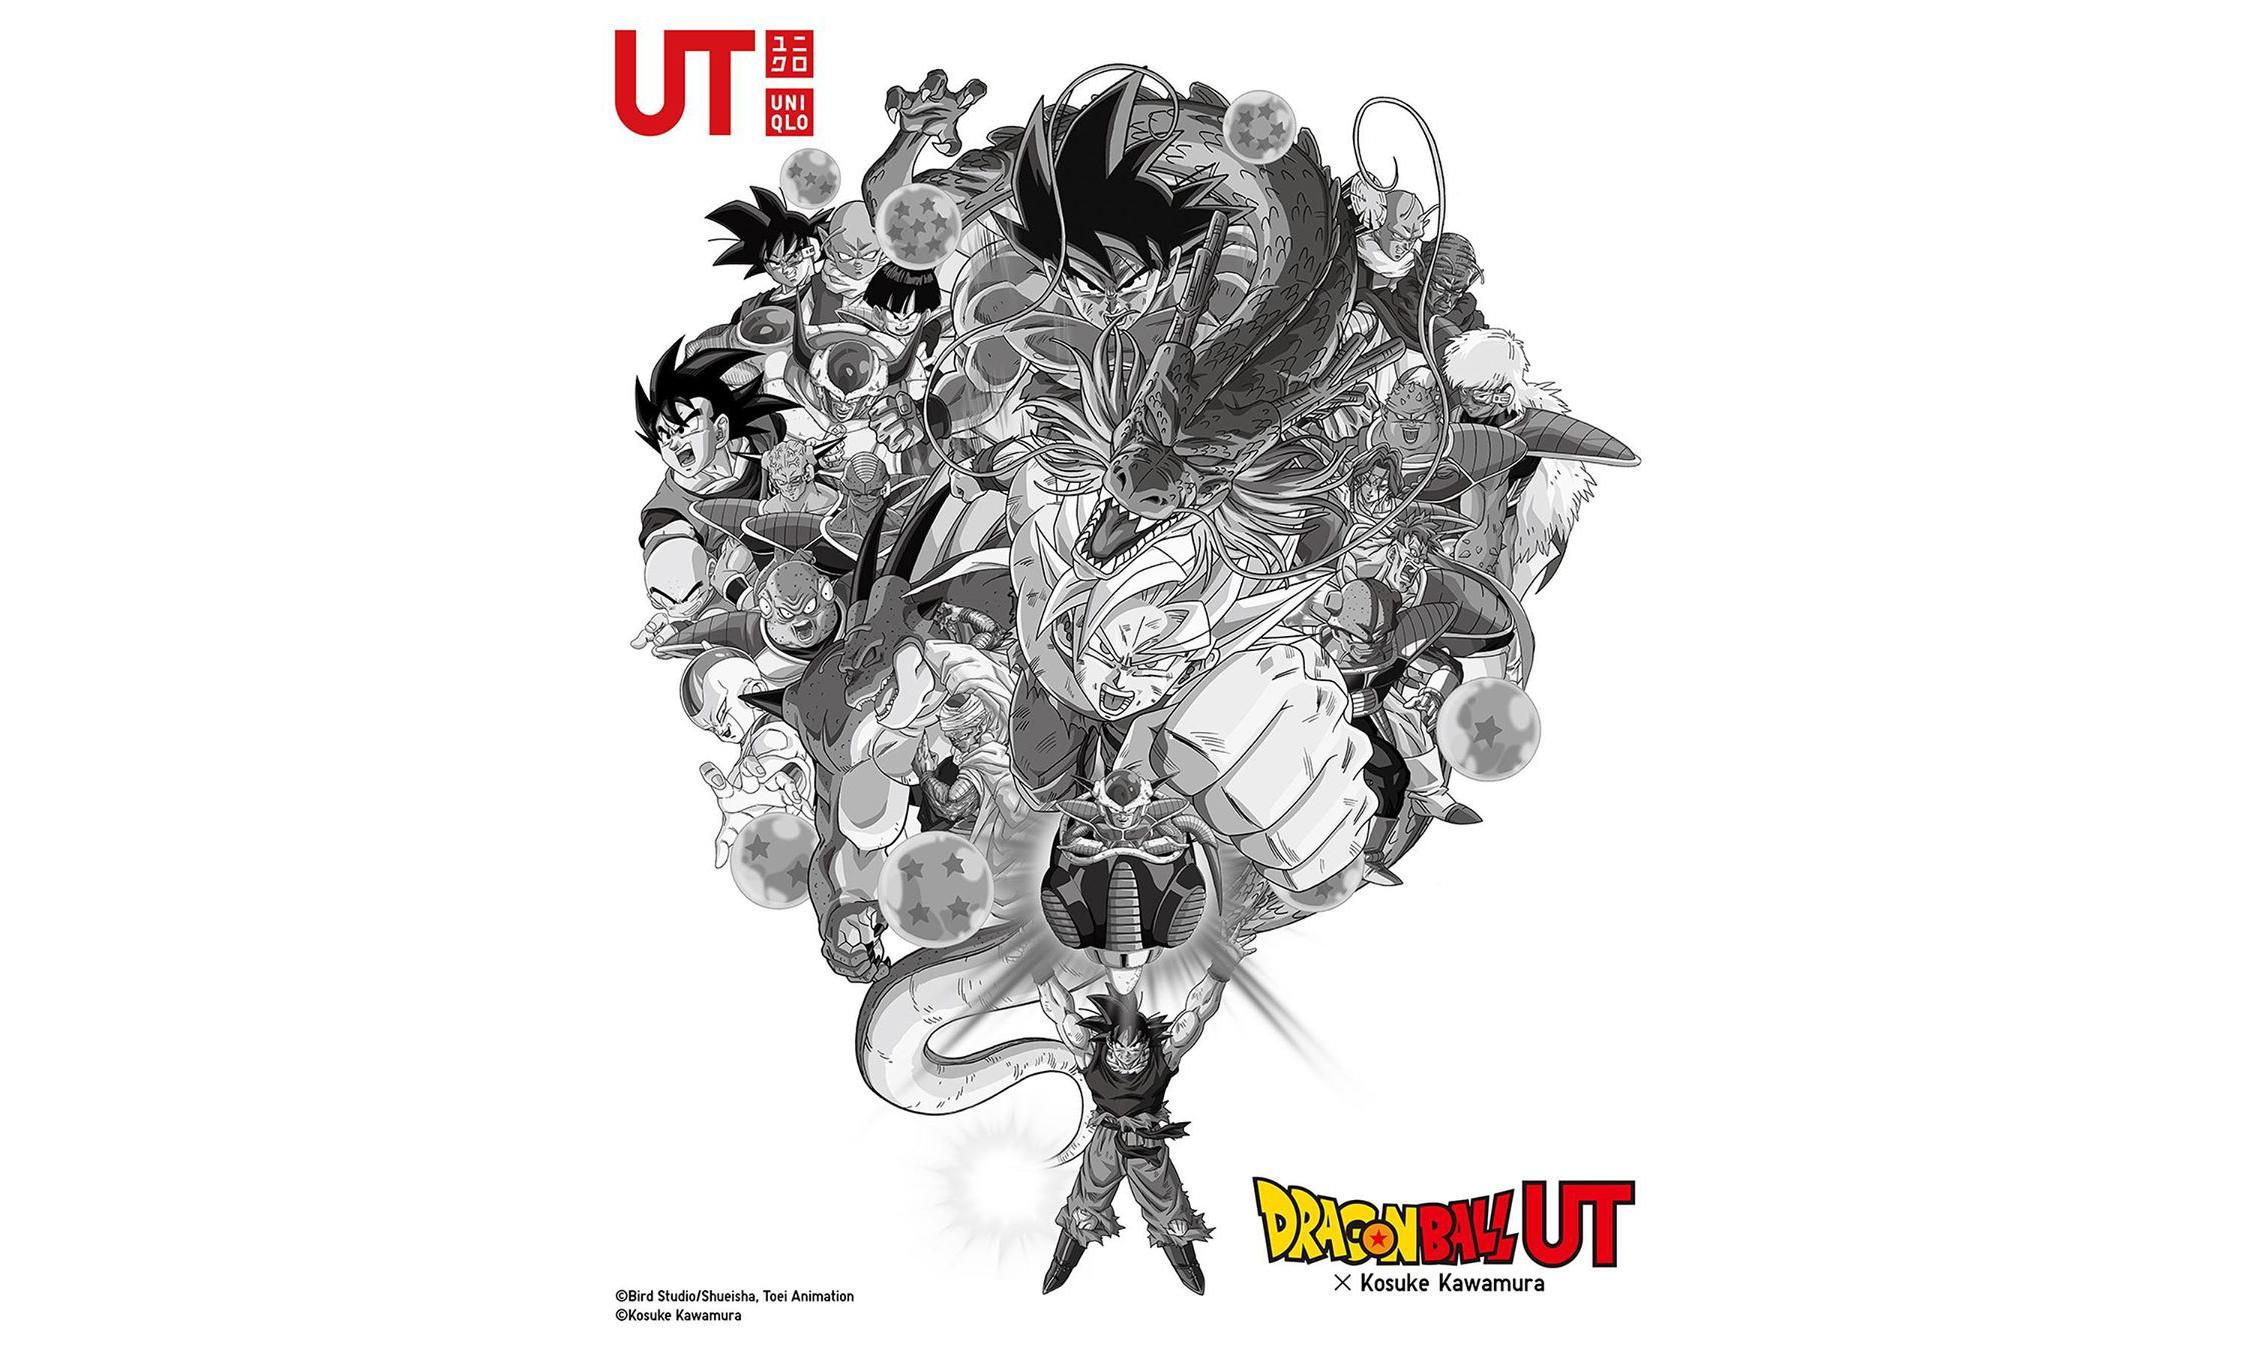 UNIQLO UT ×《Dragon Ball》× Kosuke Kawamura 联名系列将于 11 月登场